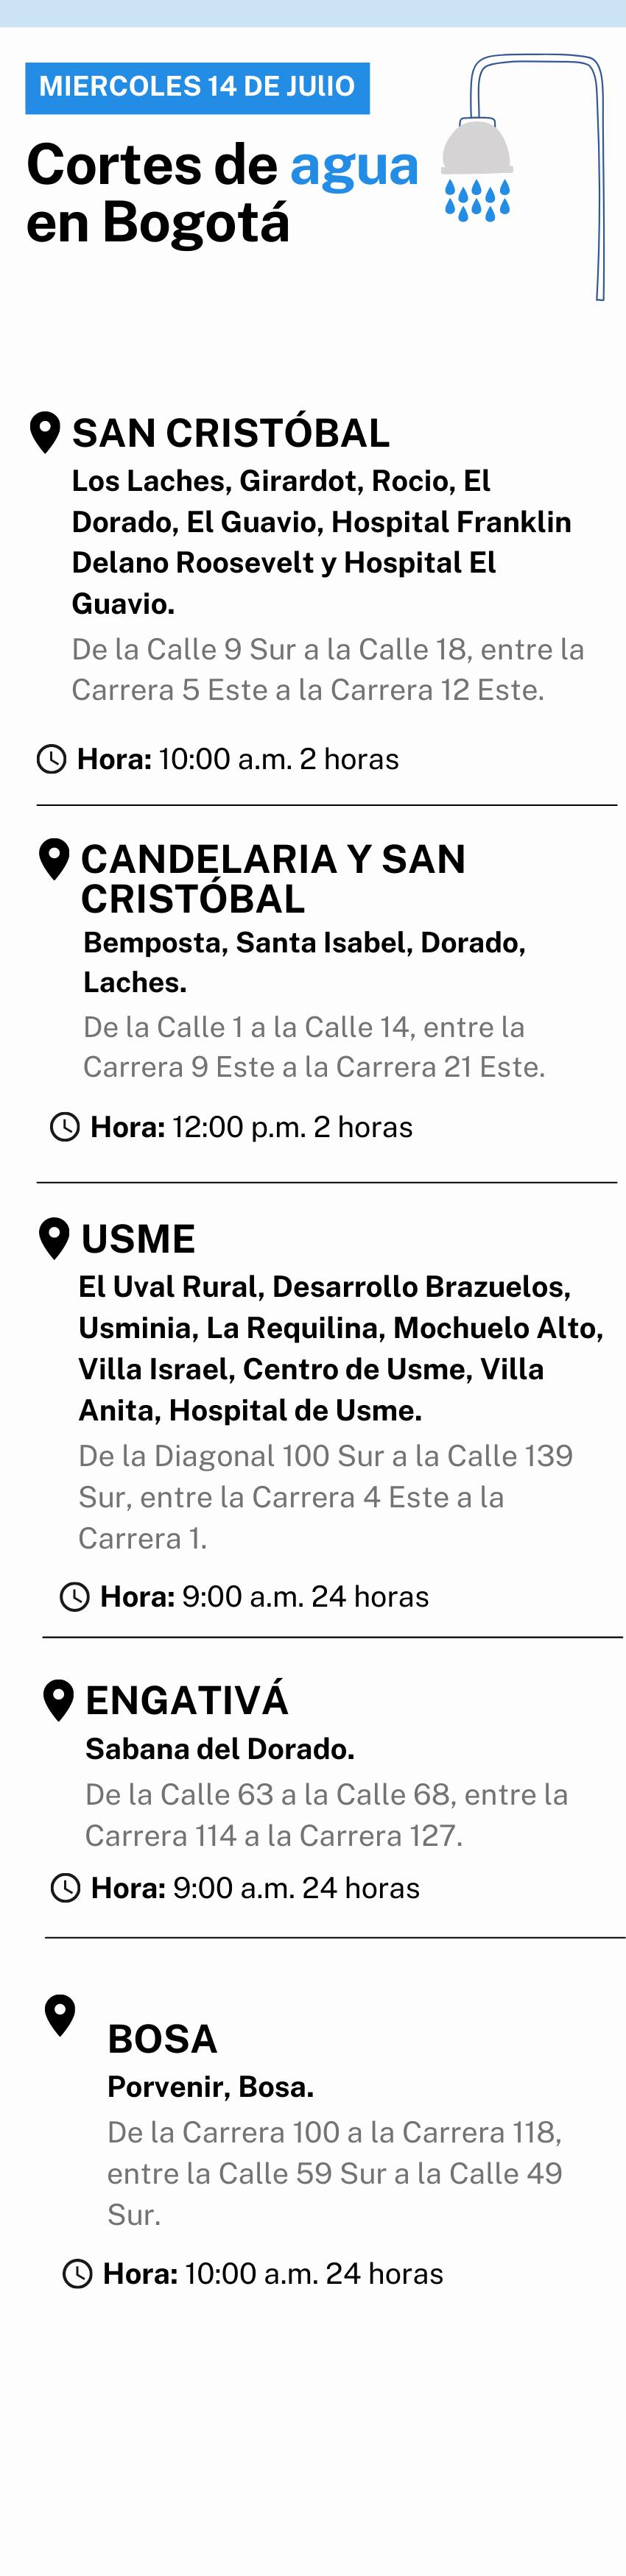 Corte de agua en Bogotámiércoles 14 de julio